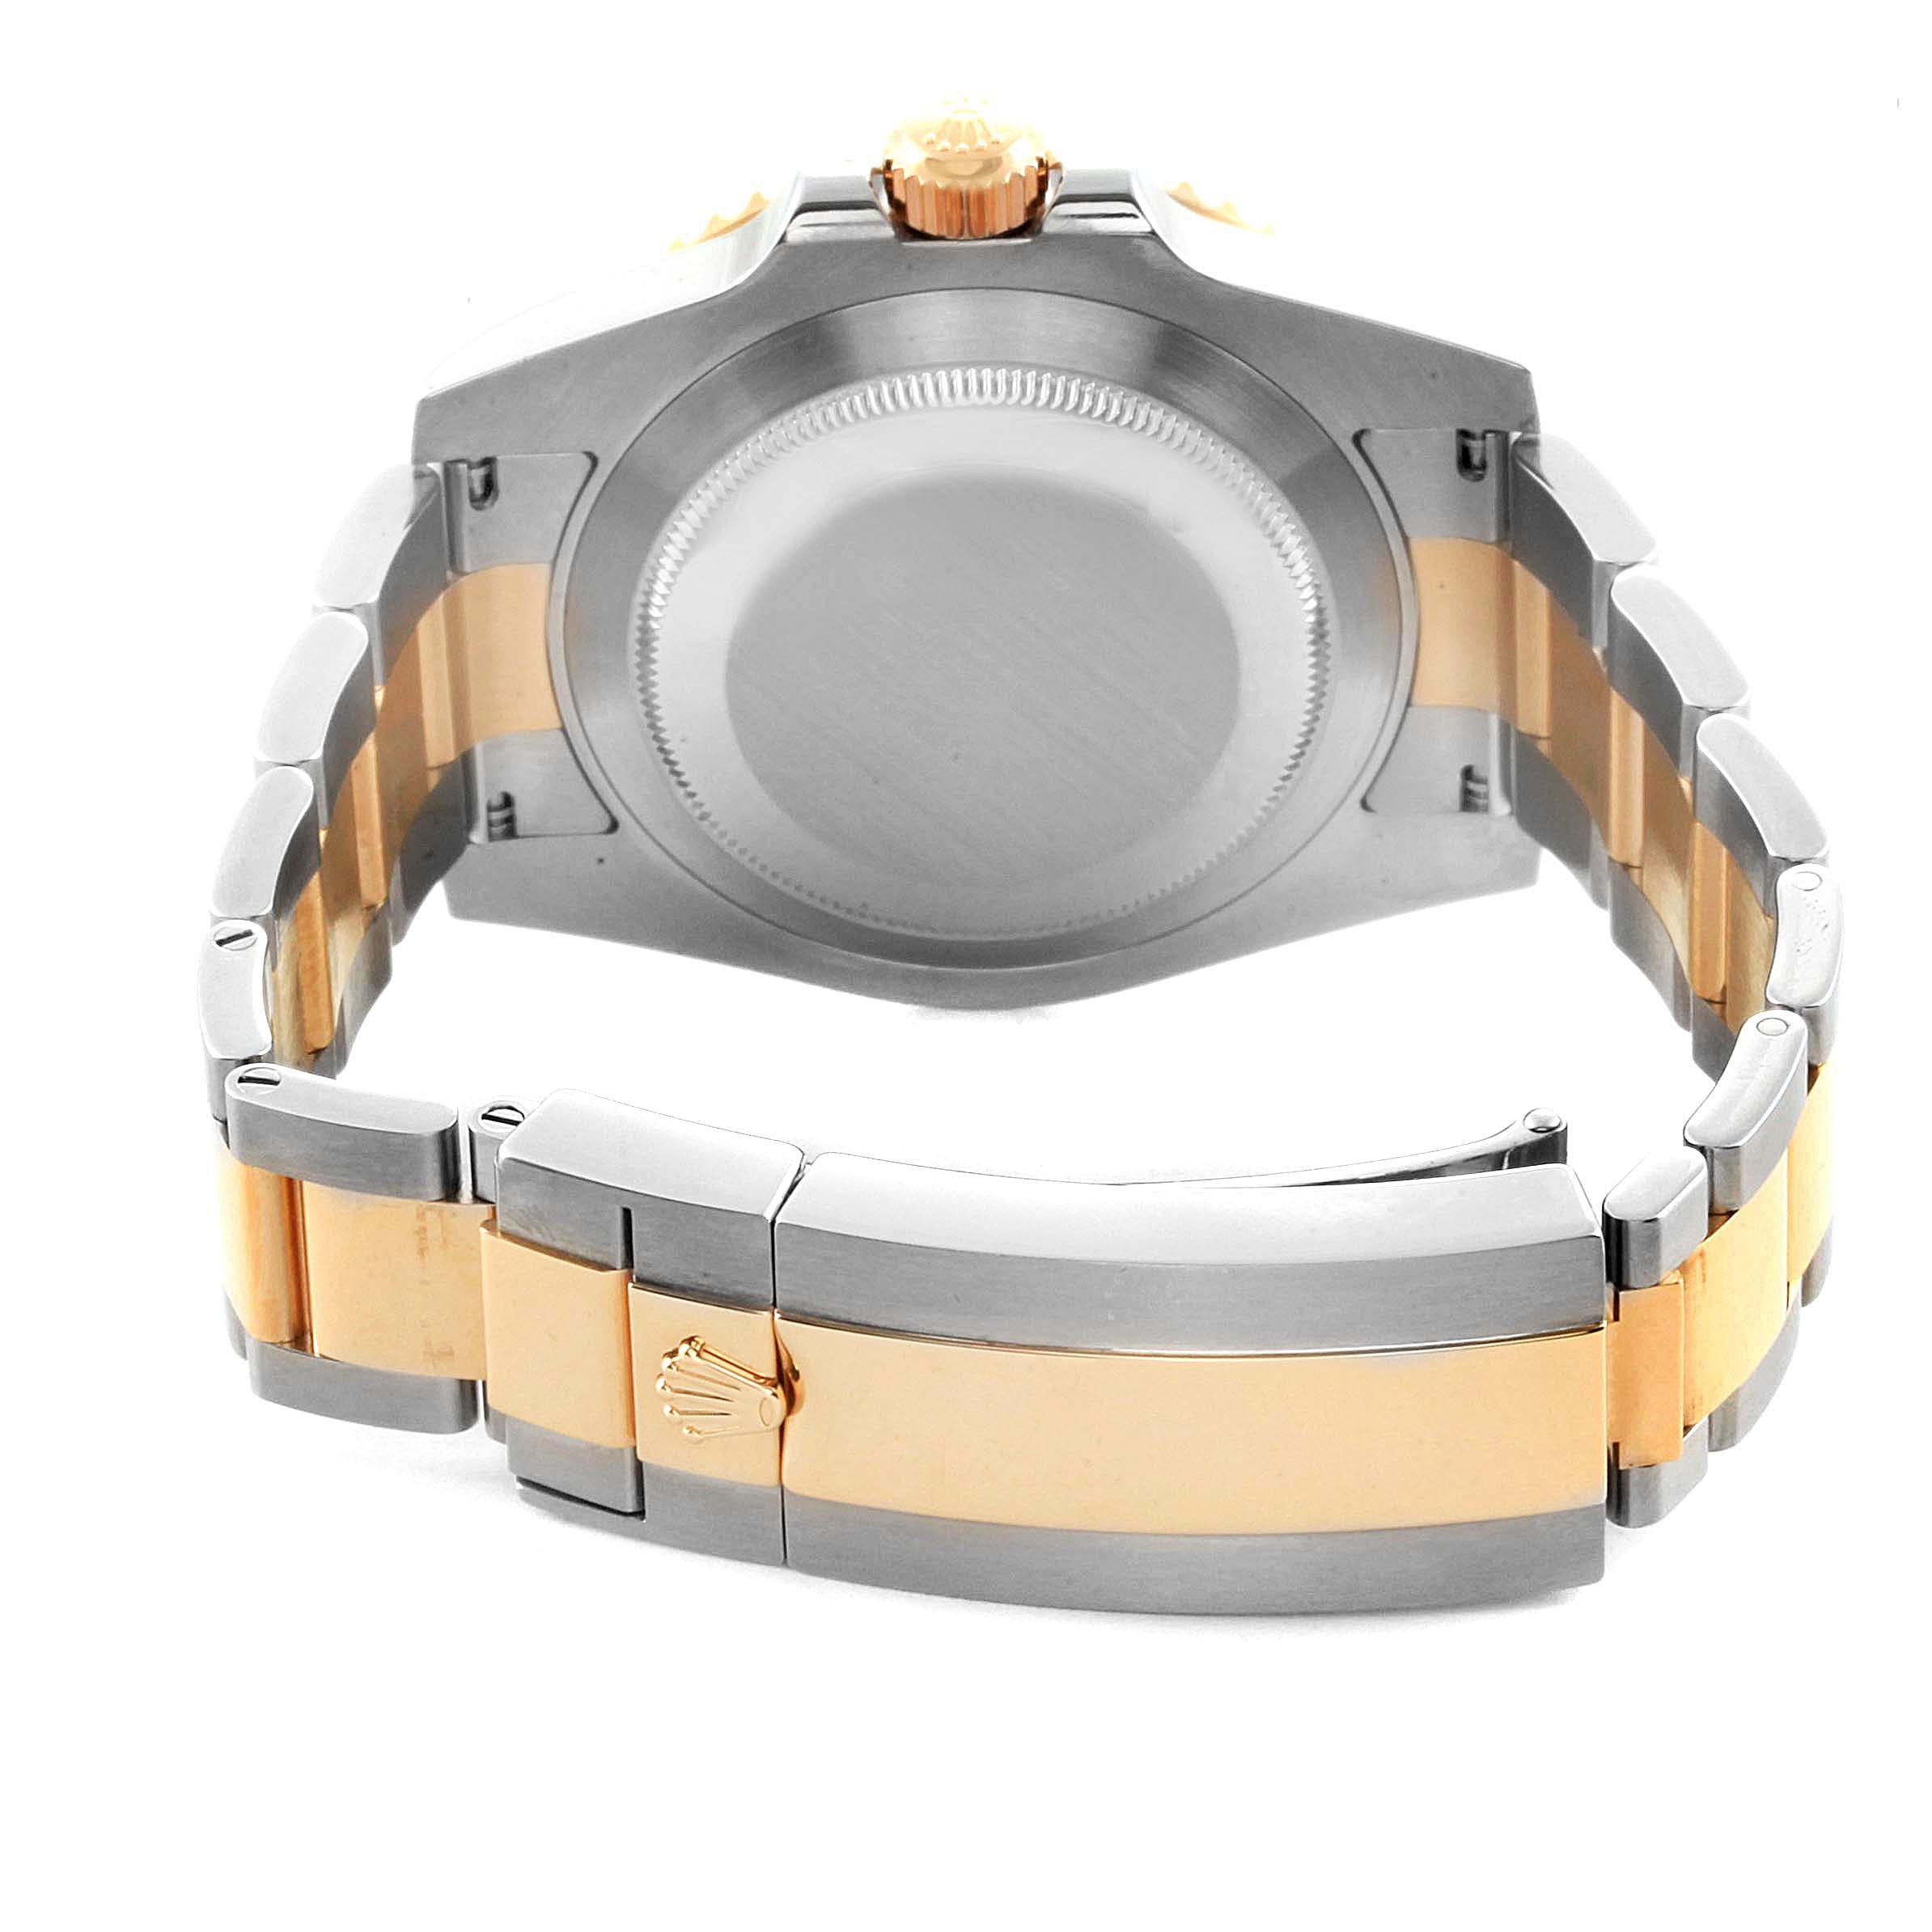 Rolex Submariner Steel 18K Yellow Gold Black Diamond Dial Watch 116613 SwissWatchExpo